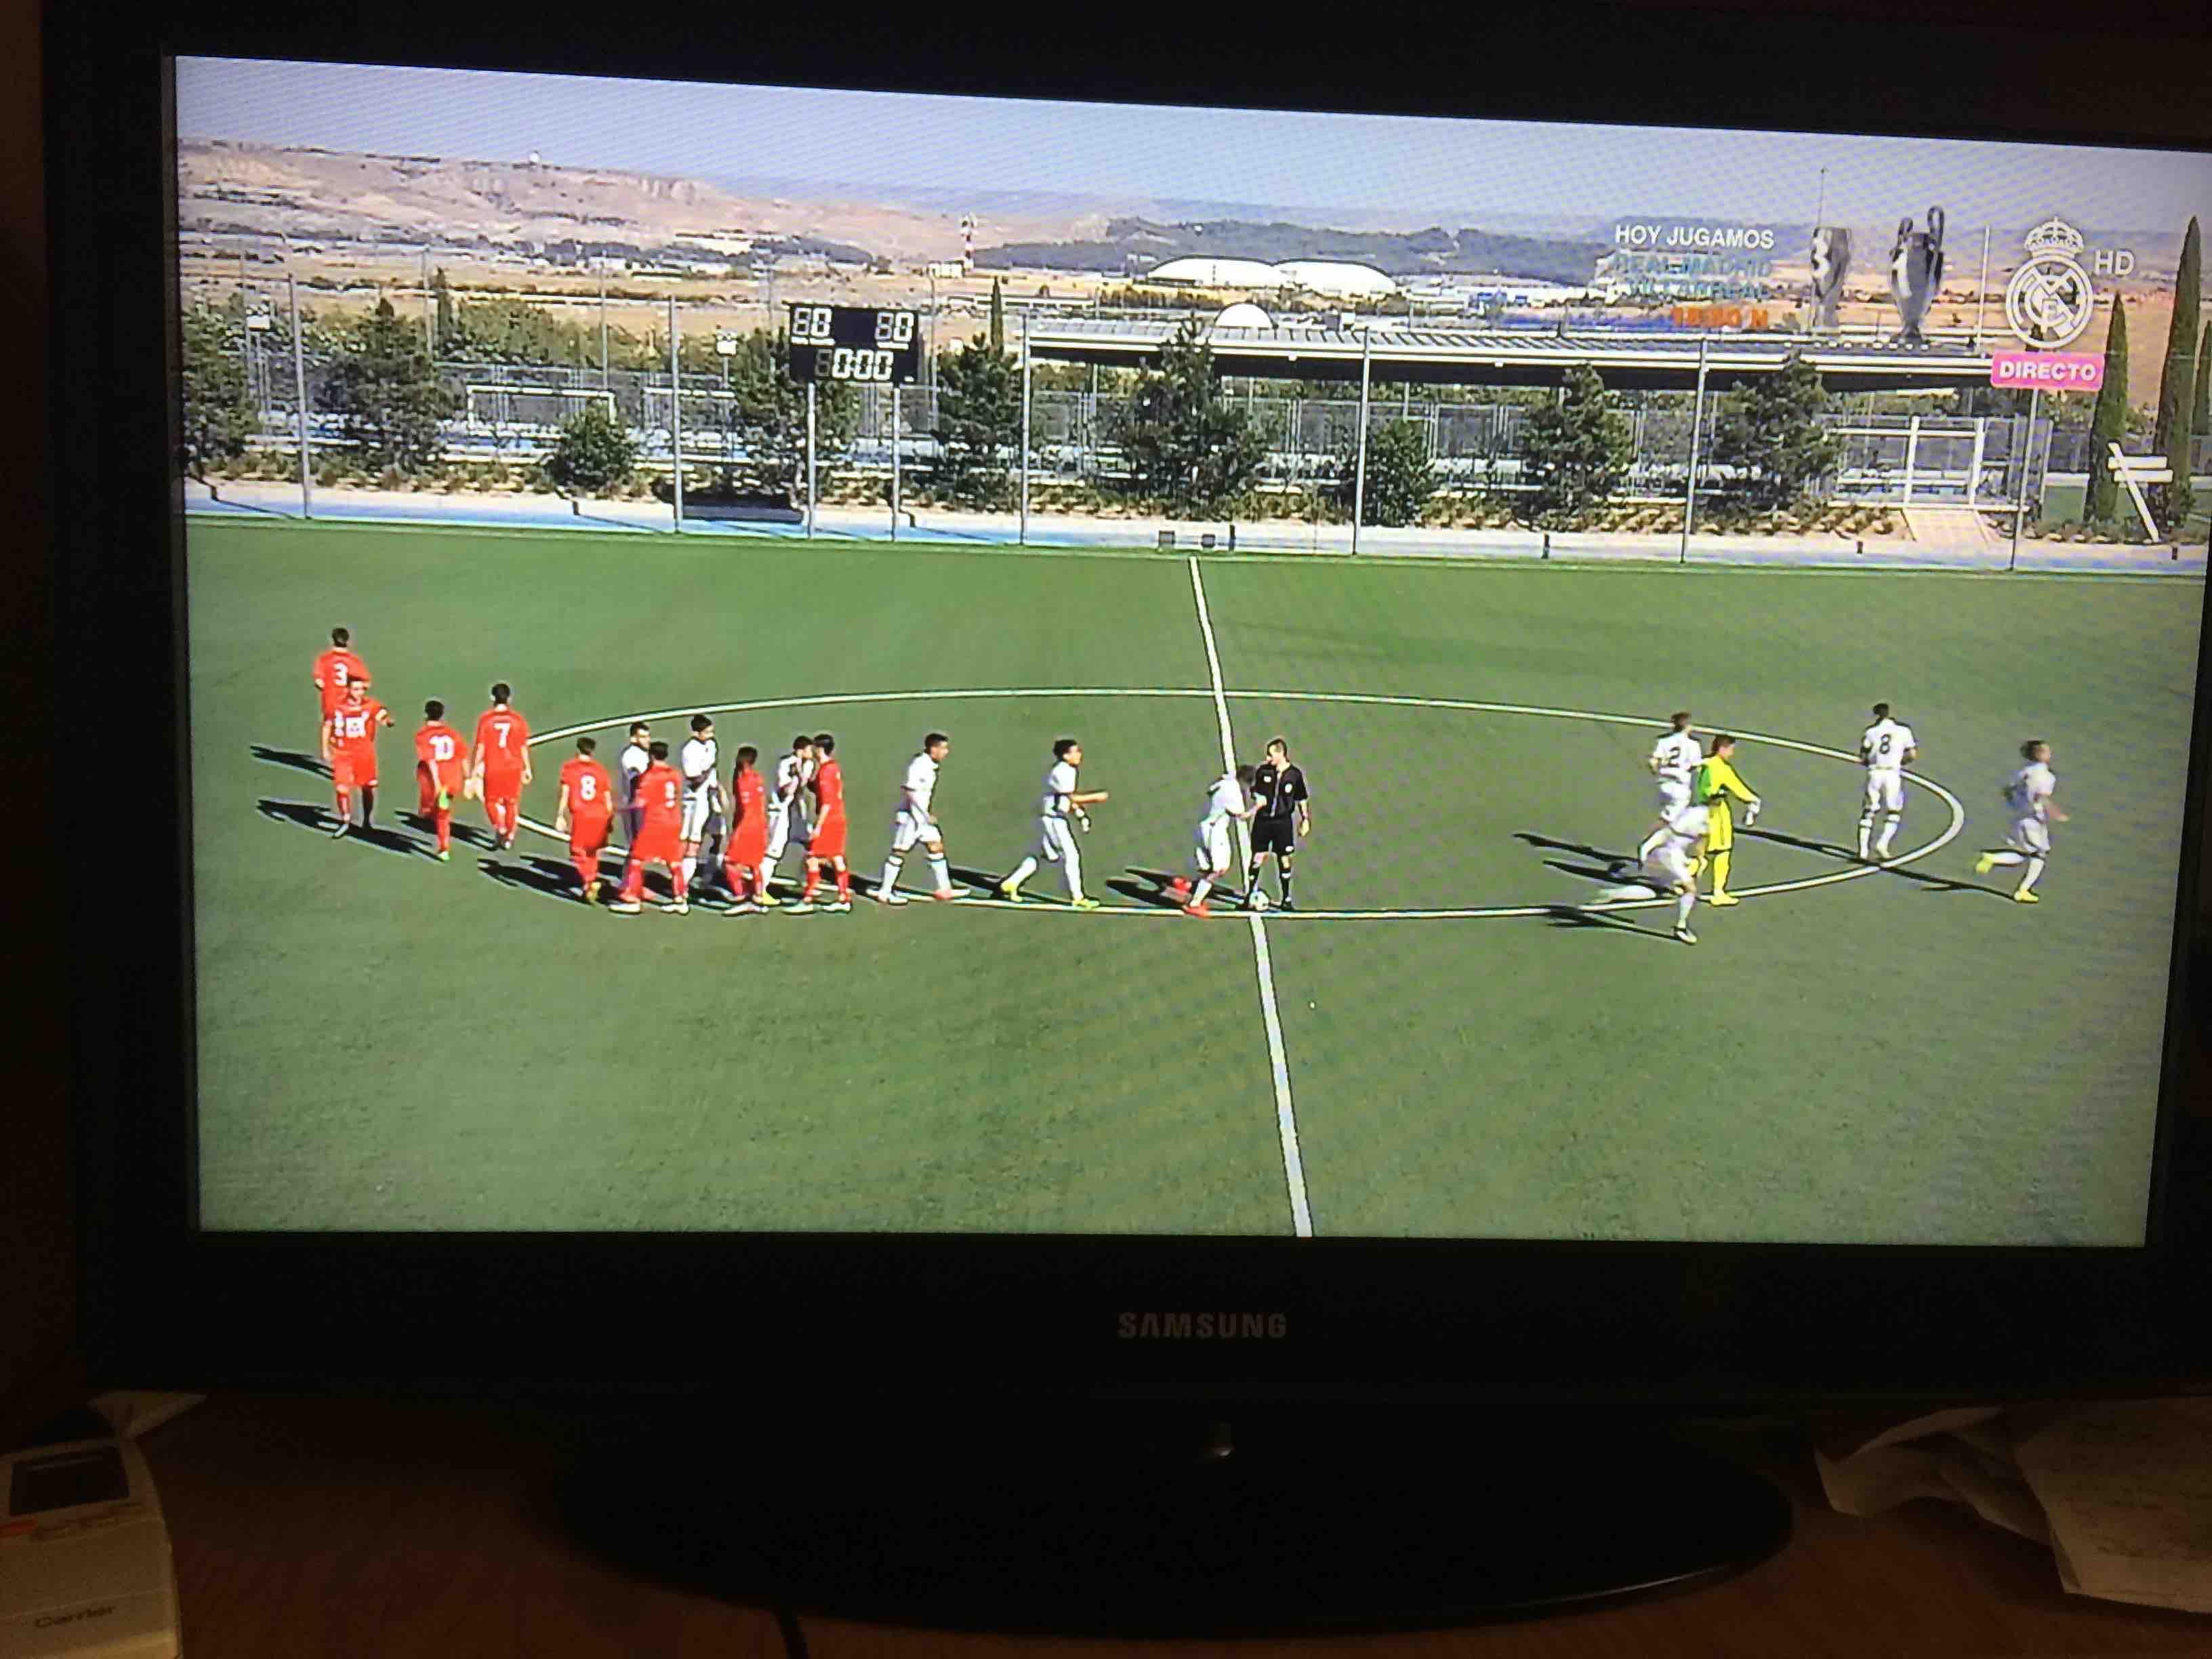 El informe de real madrid tv sobre los jugadores juveniles for Real madrid tv